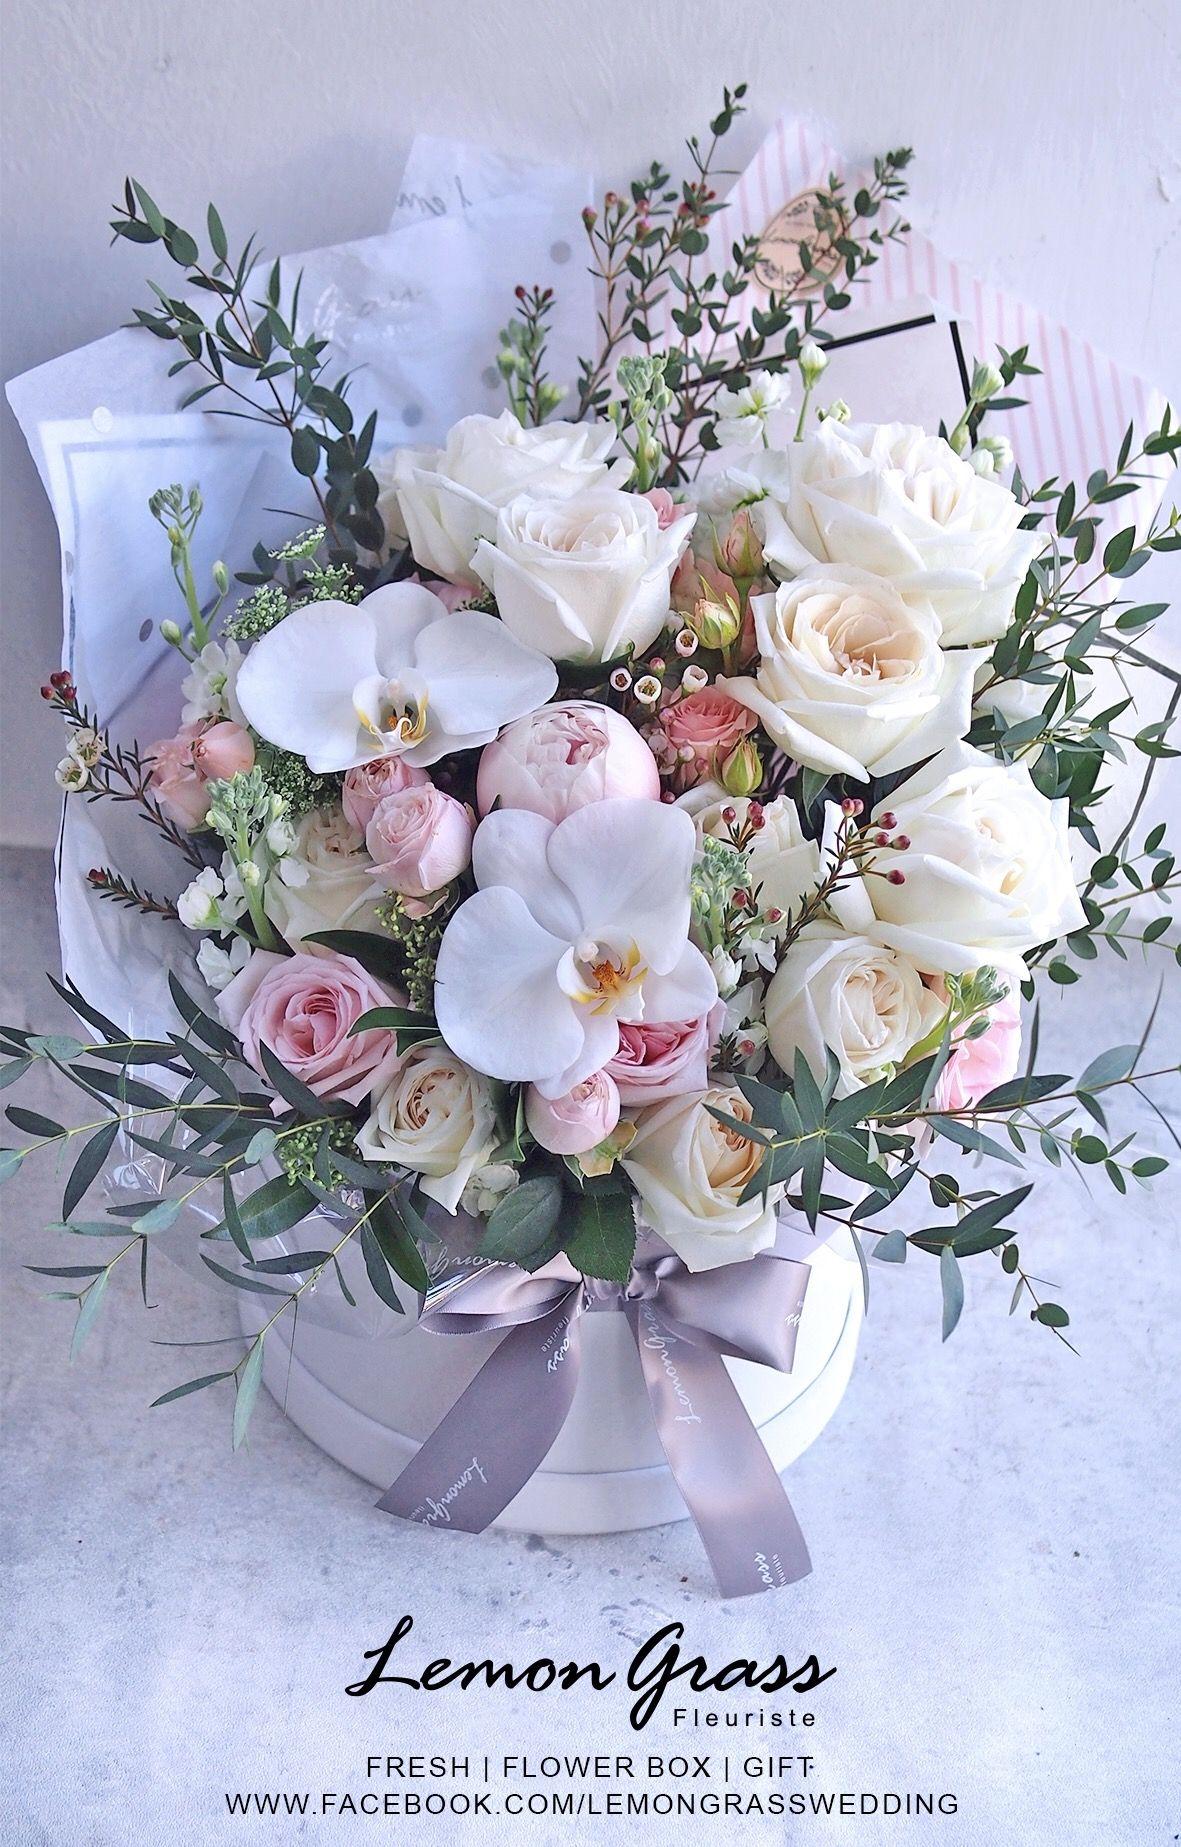 Pin by LemongrassWedding on Gifts of flowers | Pinterest | Flowers ...